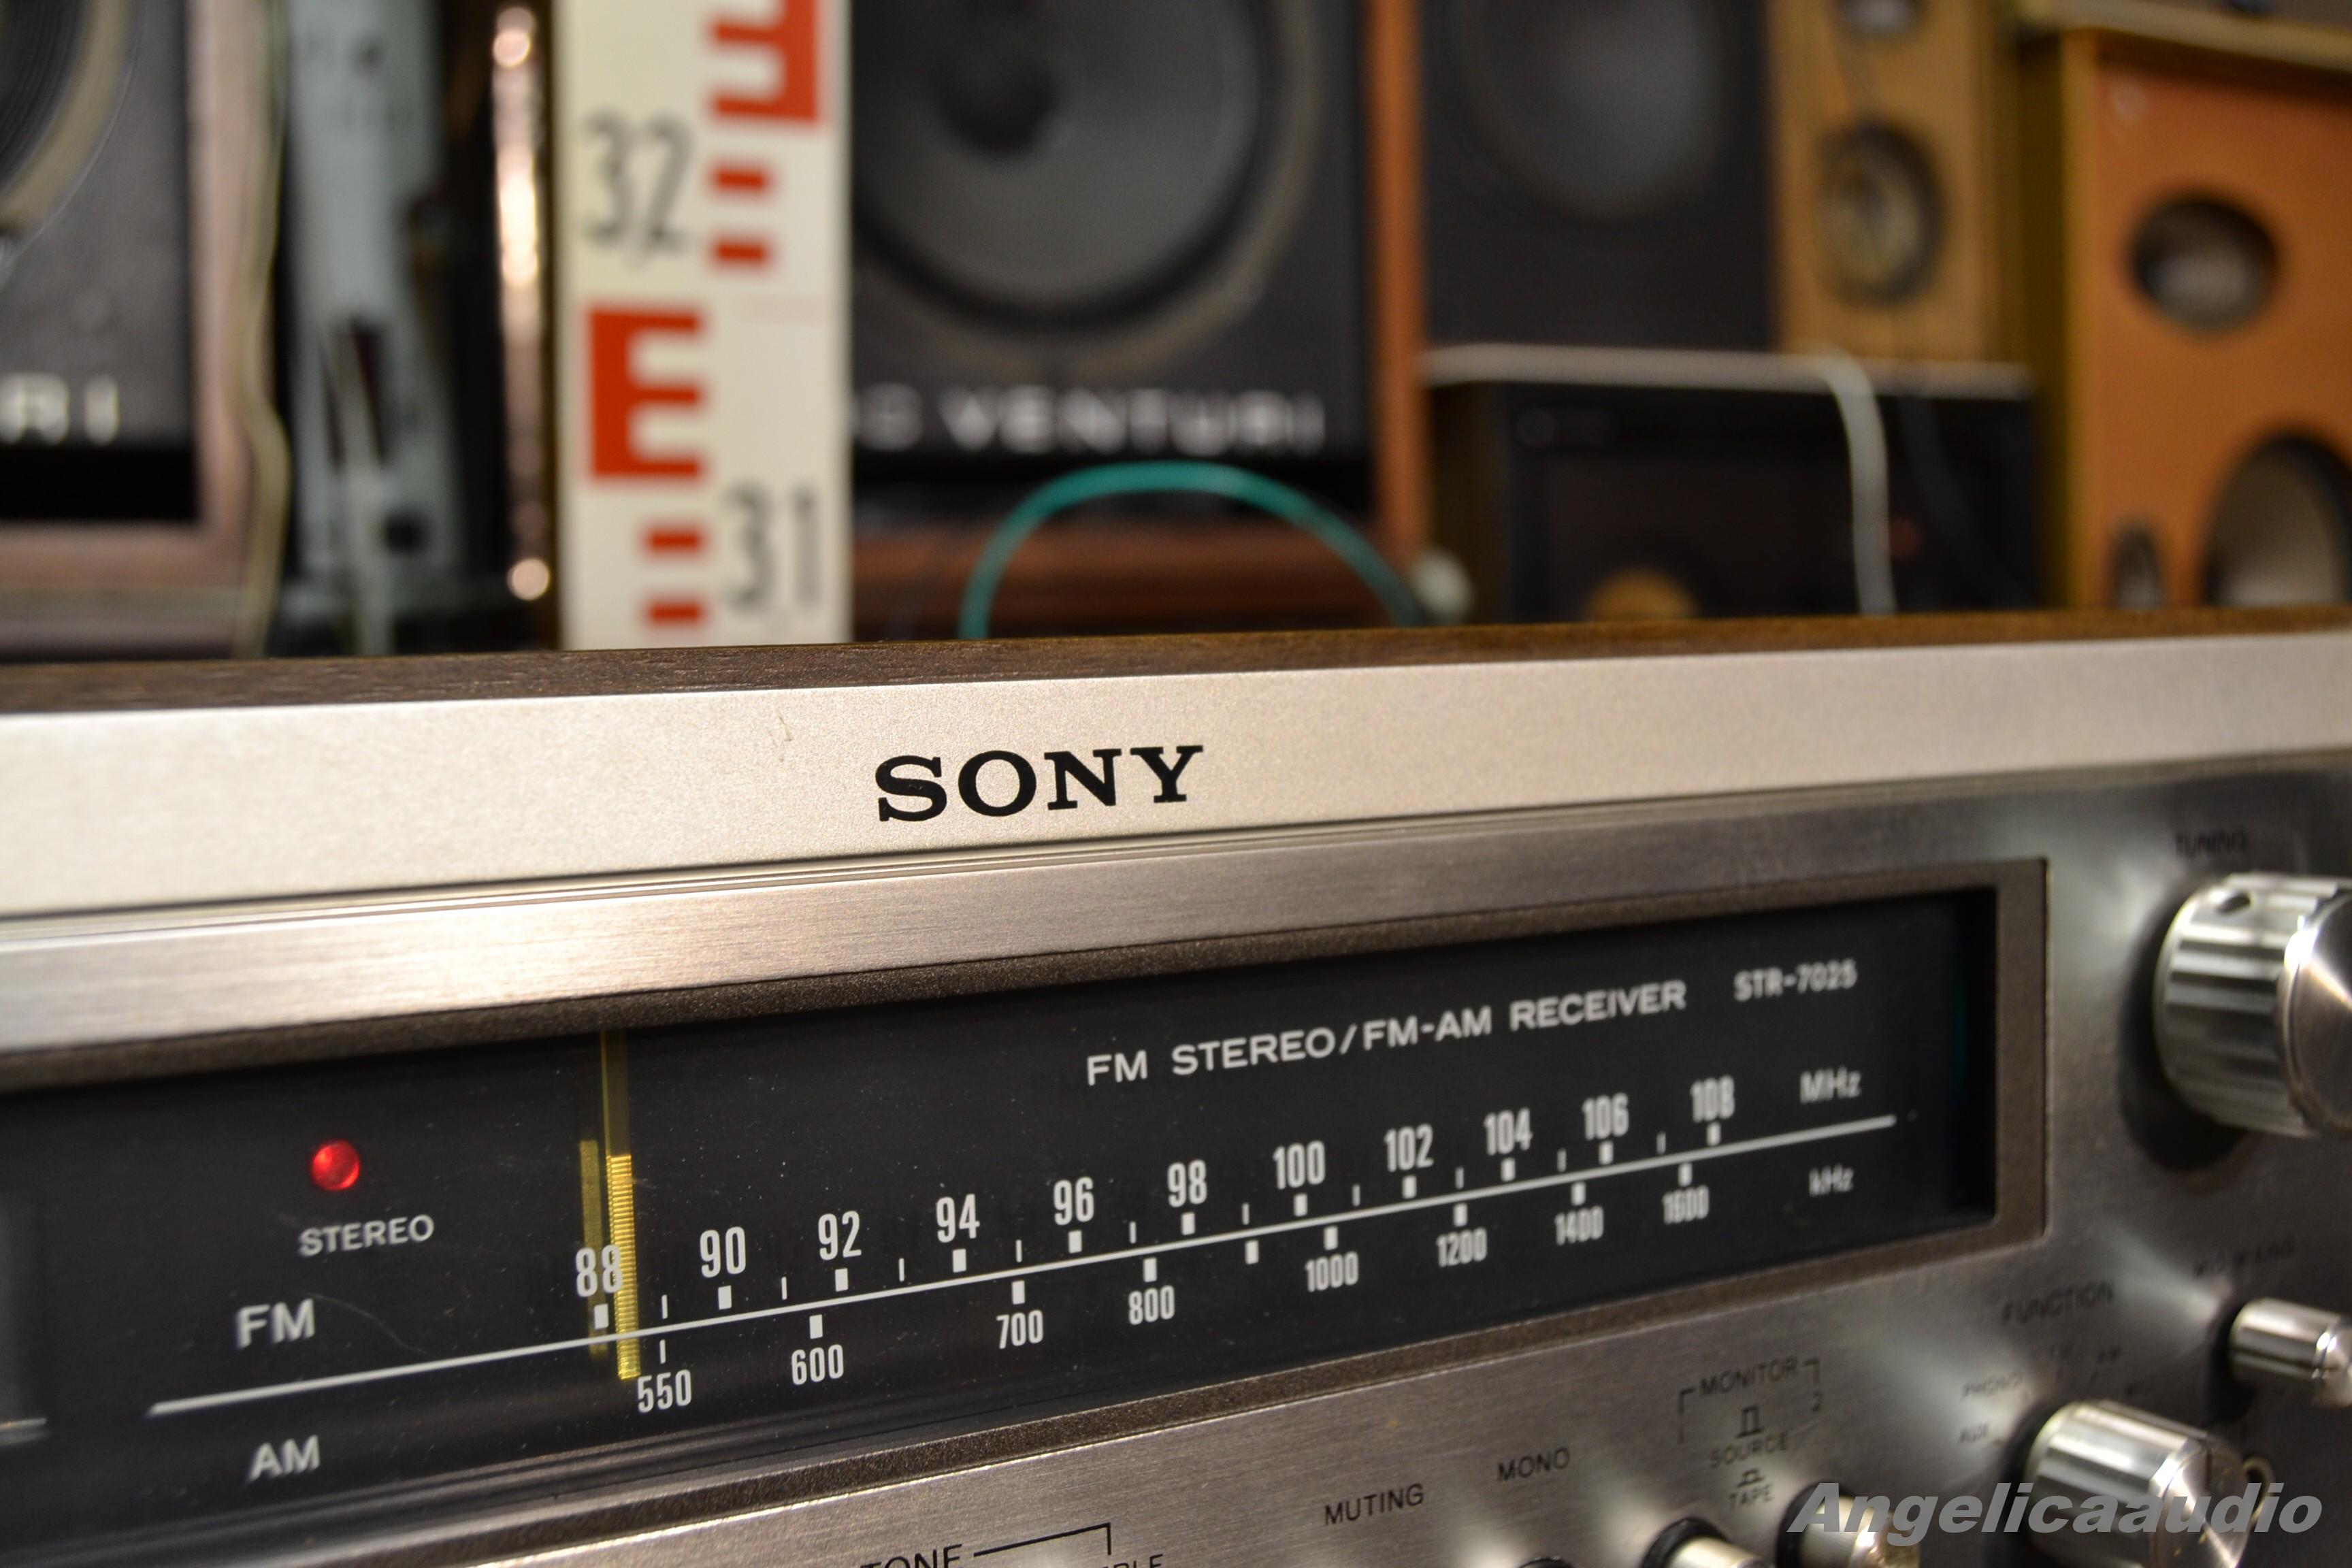 SONY STR-7025 receiver JAPAN 1975 (120V) : Angelicaaudio 1990